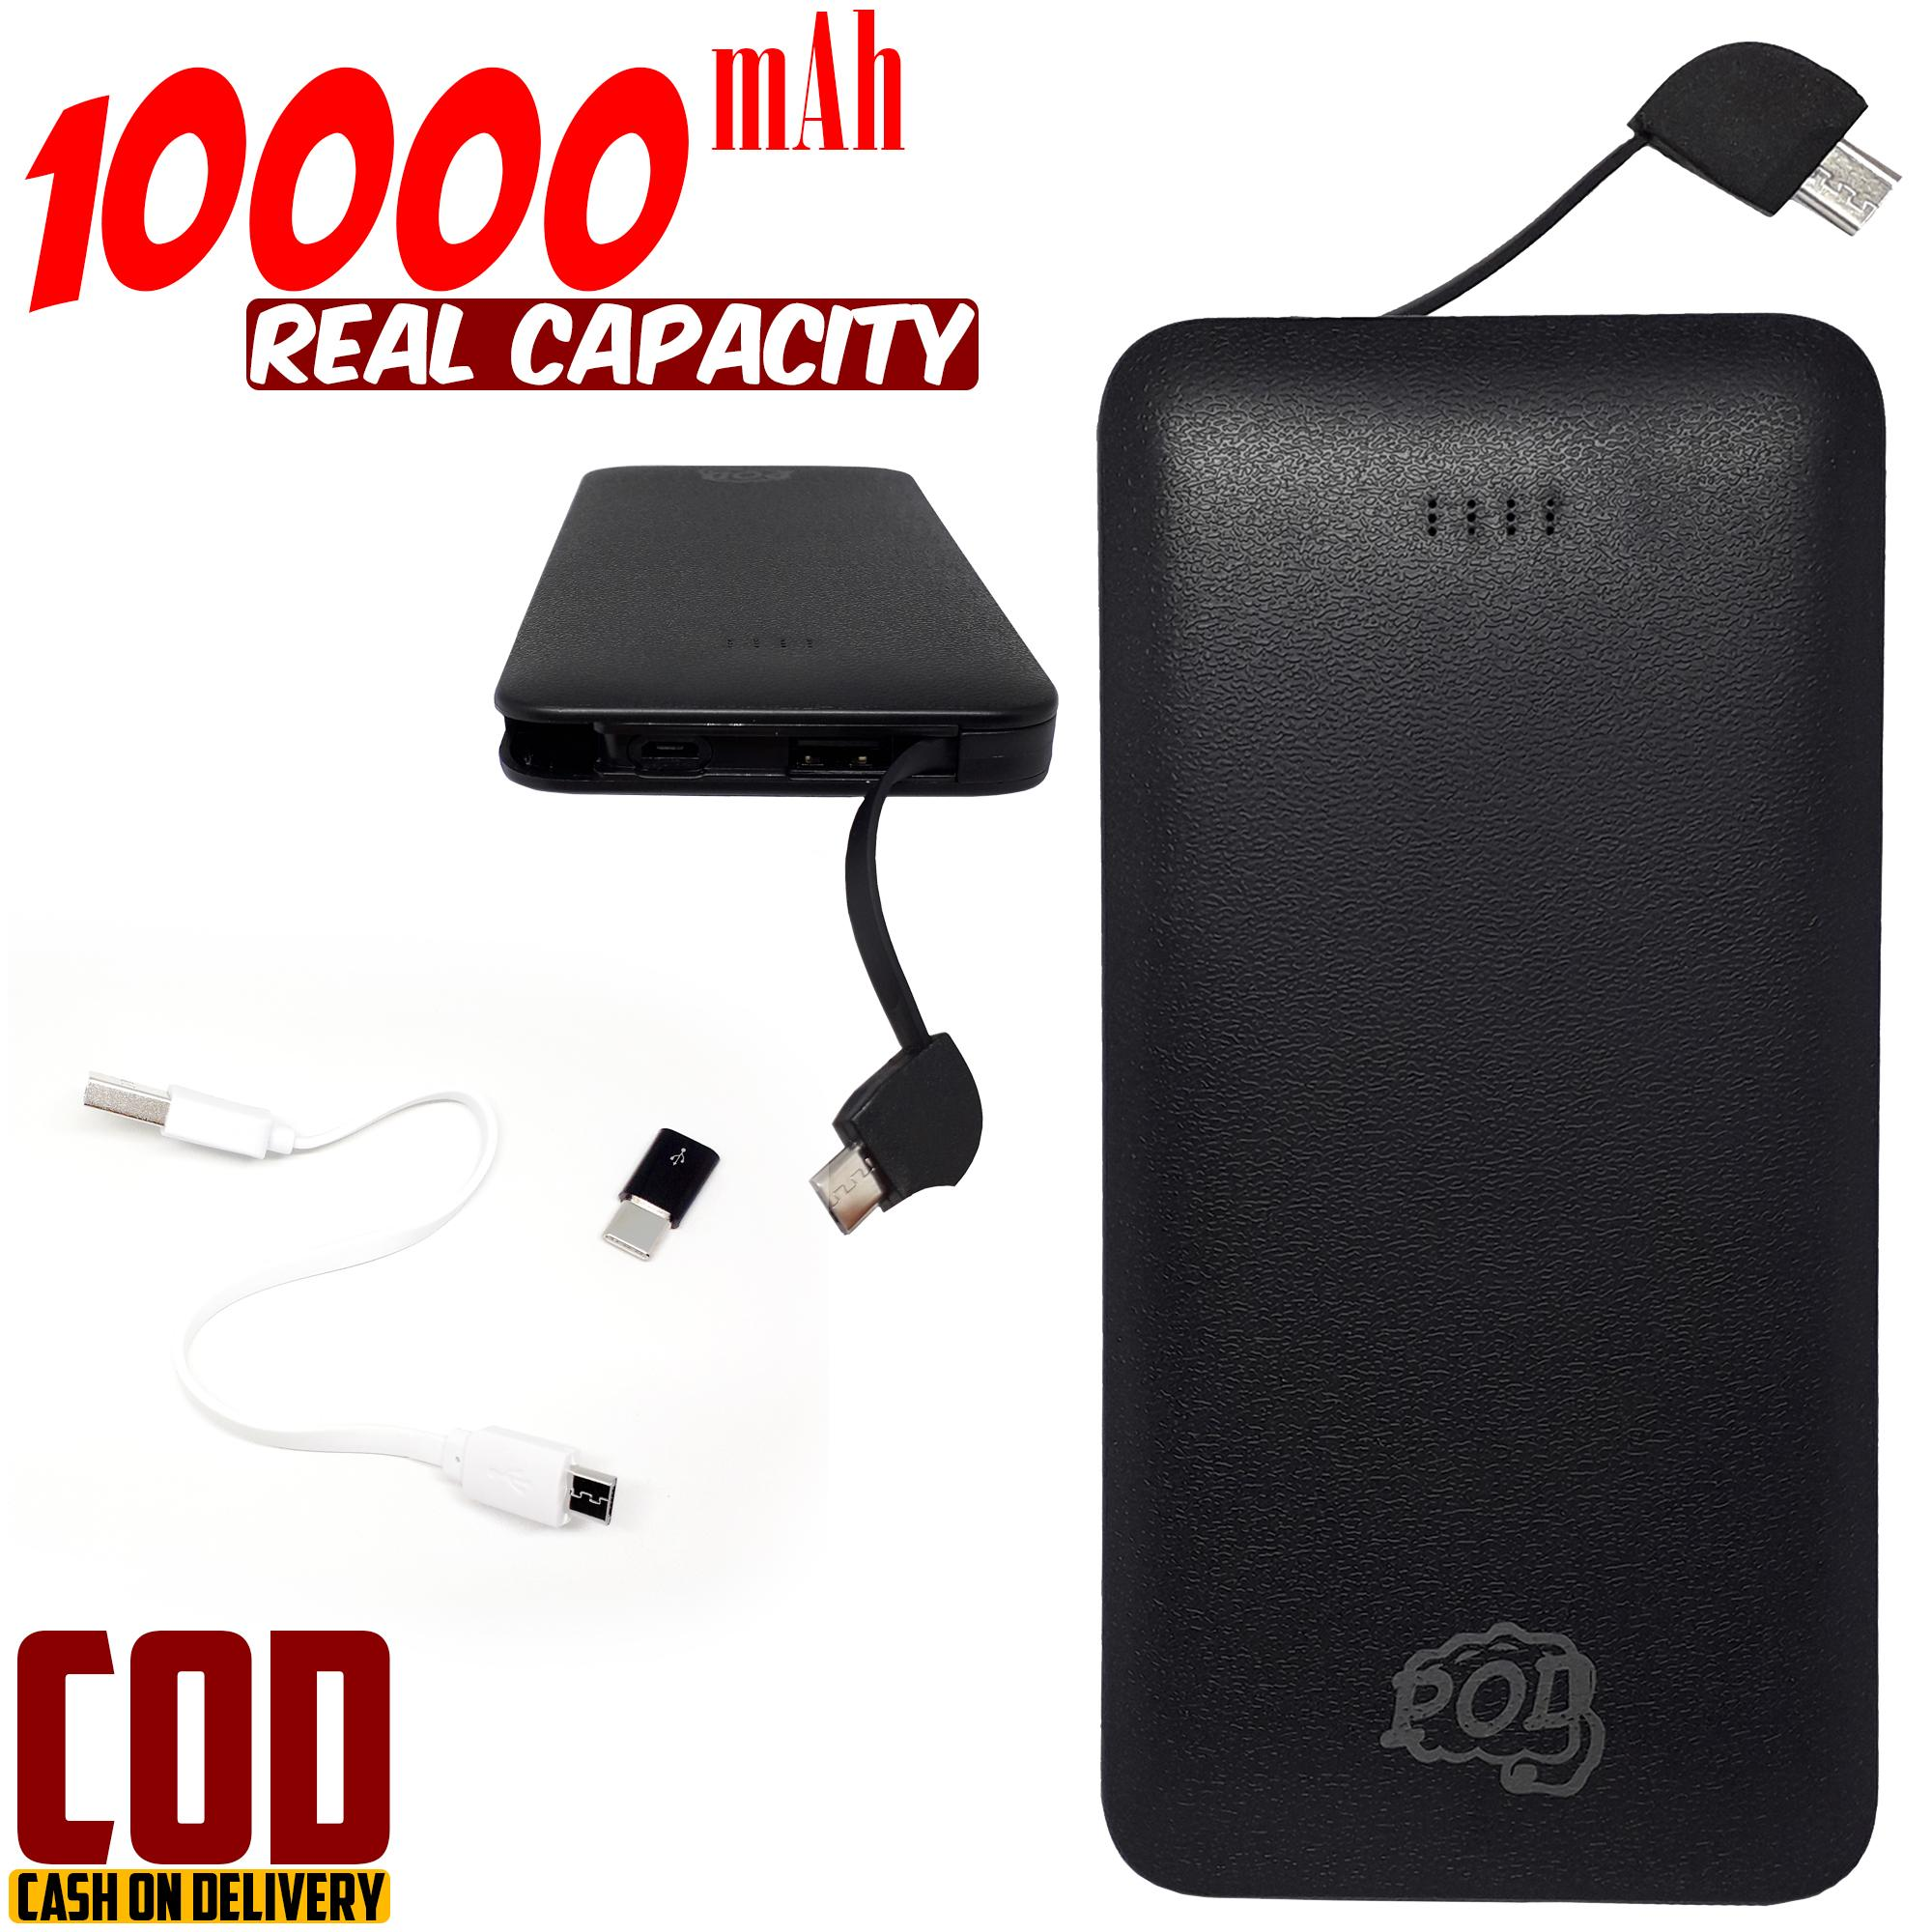 powerbank 10000mah real capacity connector type – c fast charging pod series premium quality